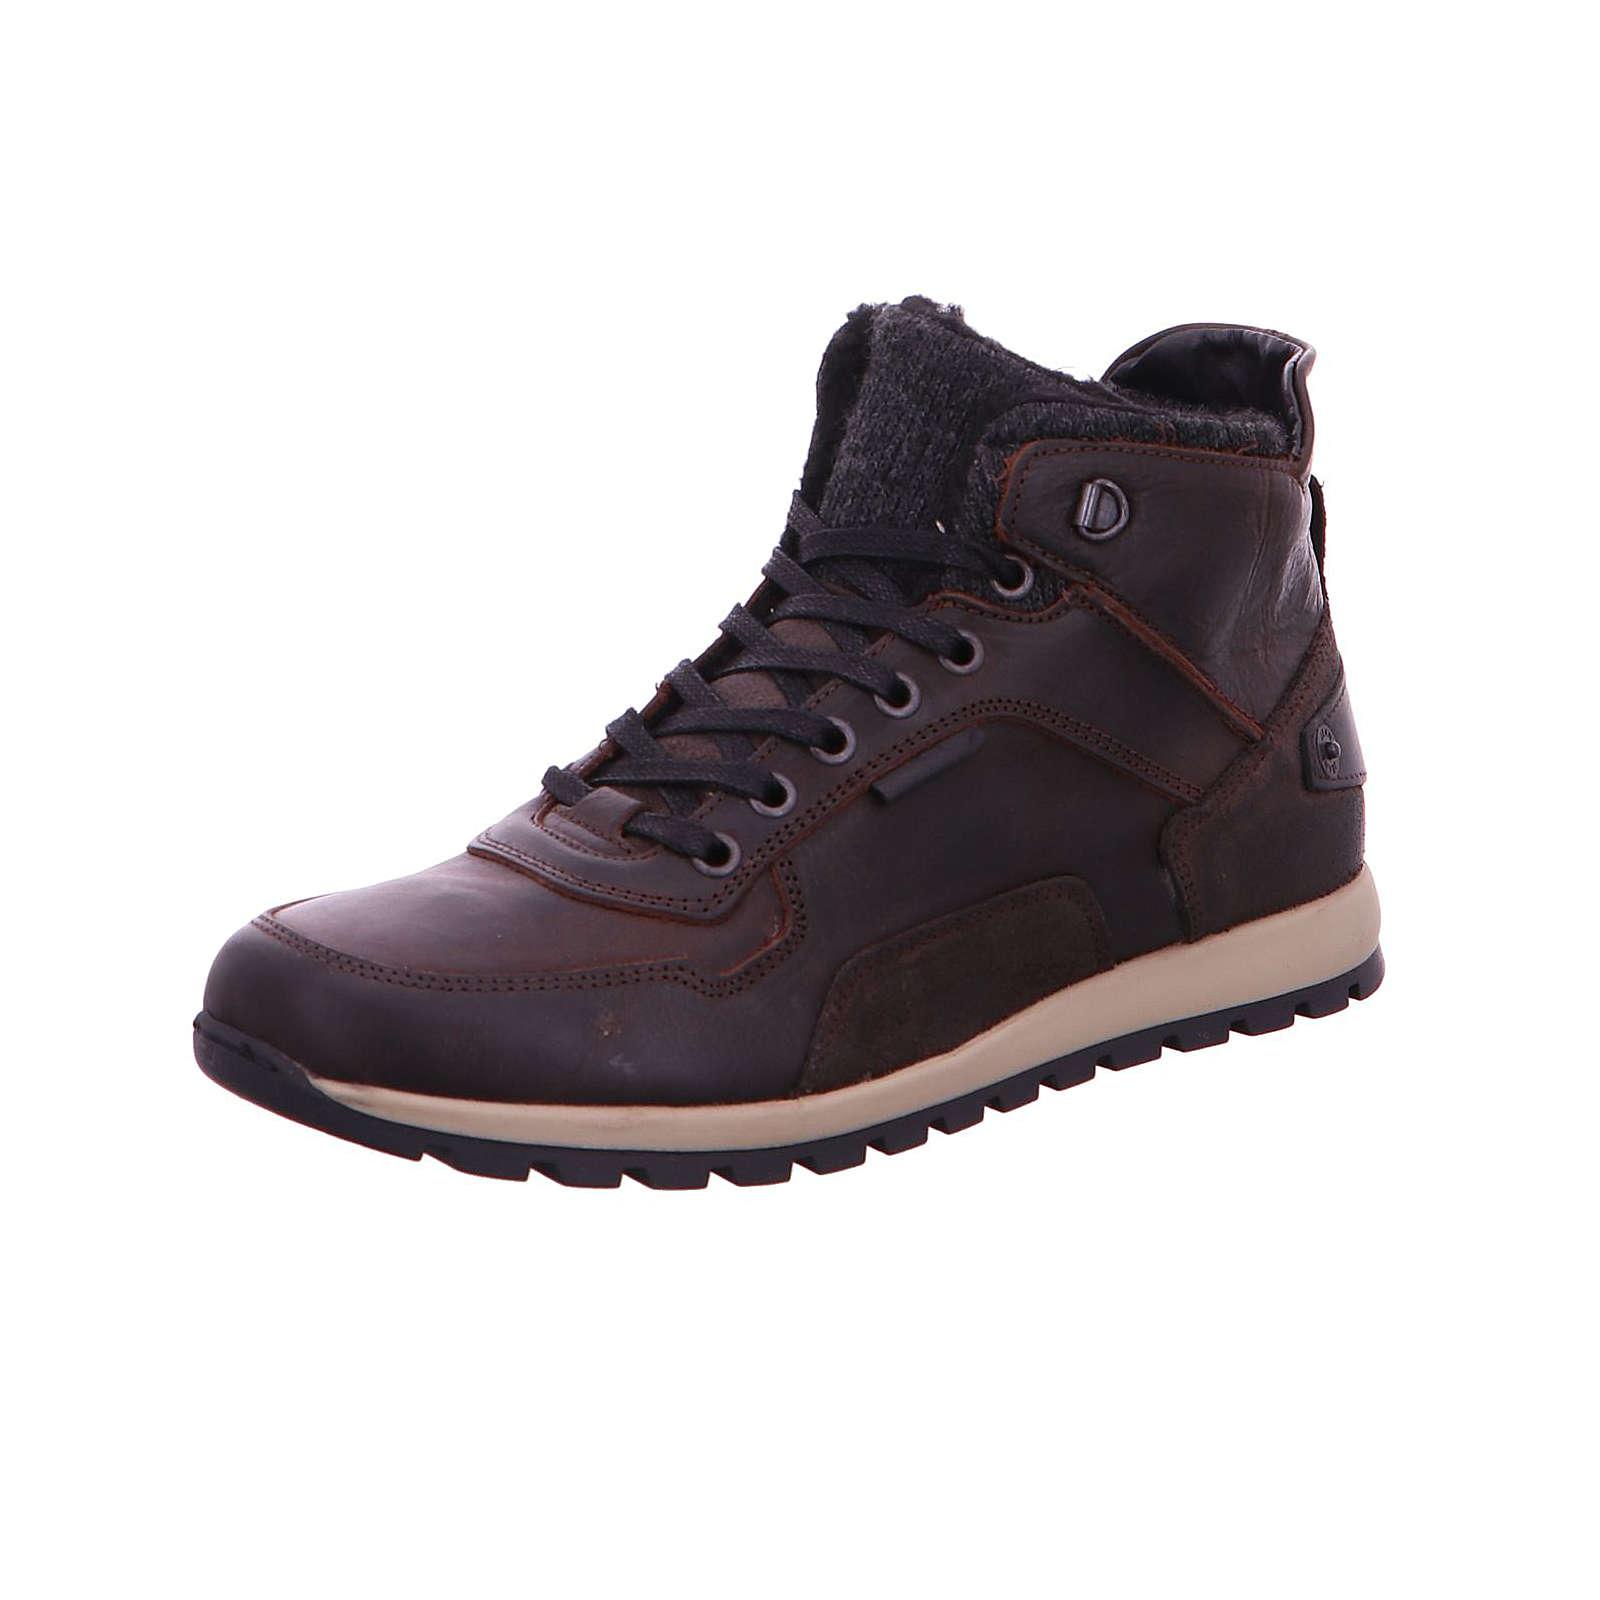 BULLBOXER Sneakers High braun Herren Gr. 41